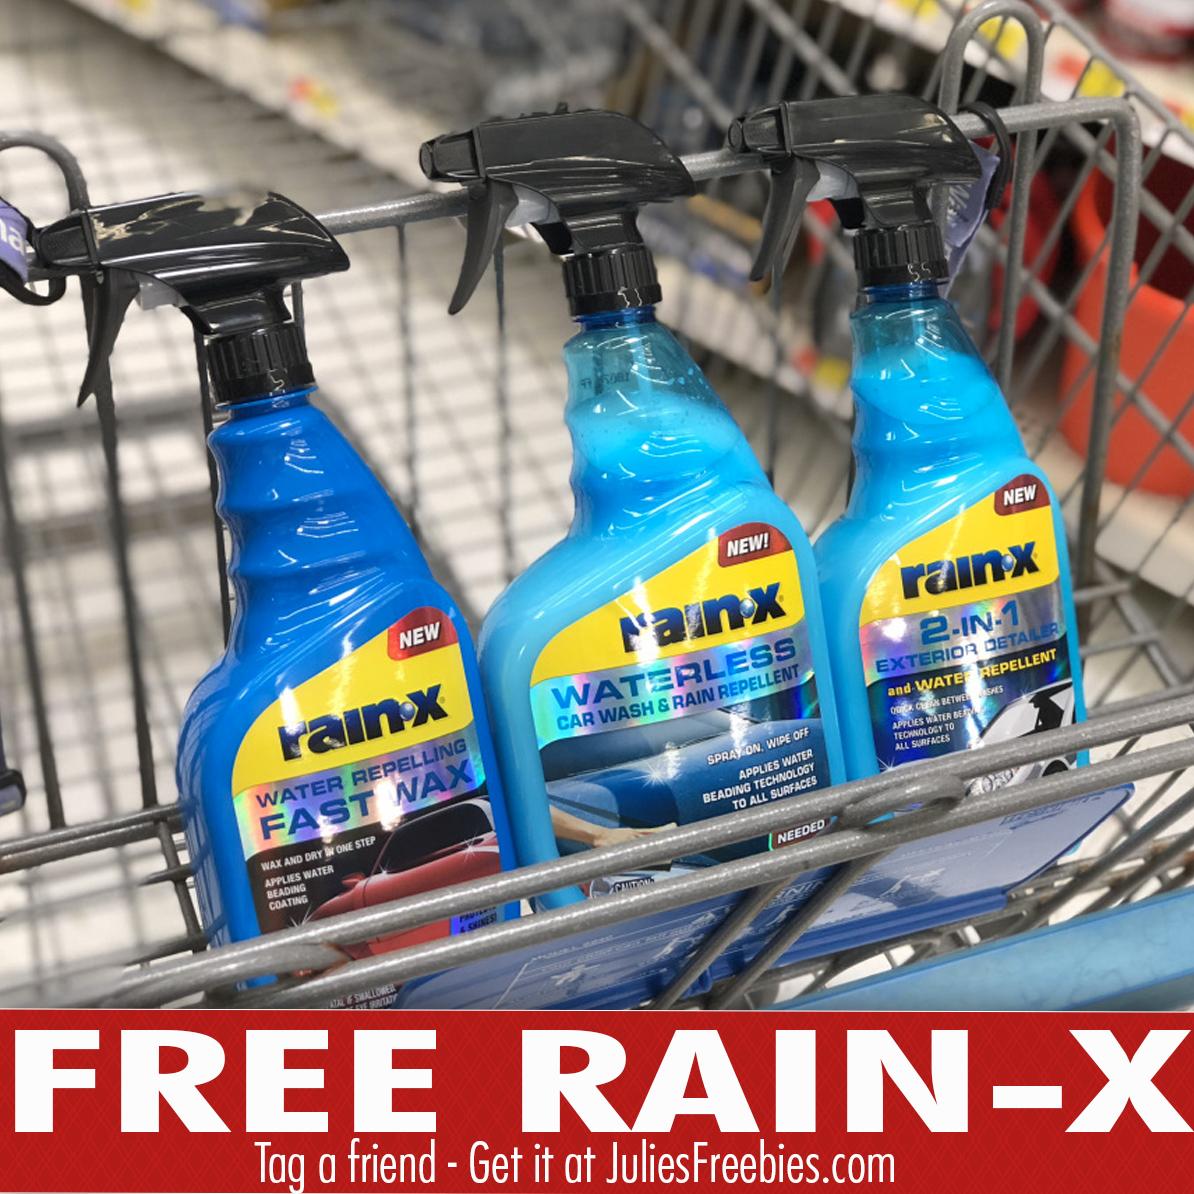 Free Rain-X Car Wash Products at Walmart (After Rebate) - Julie's